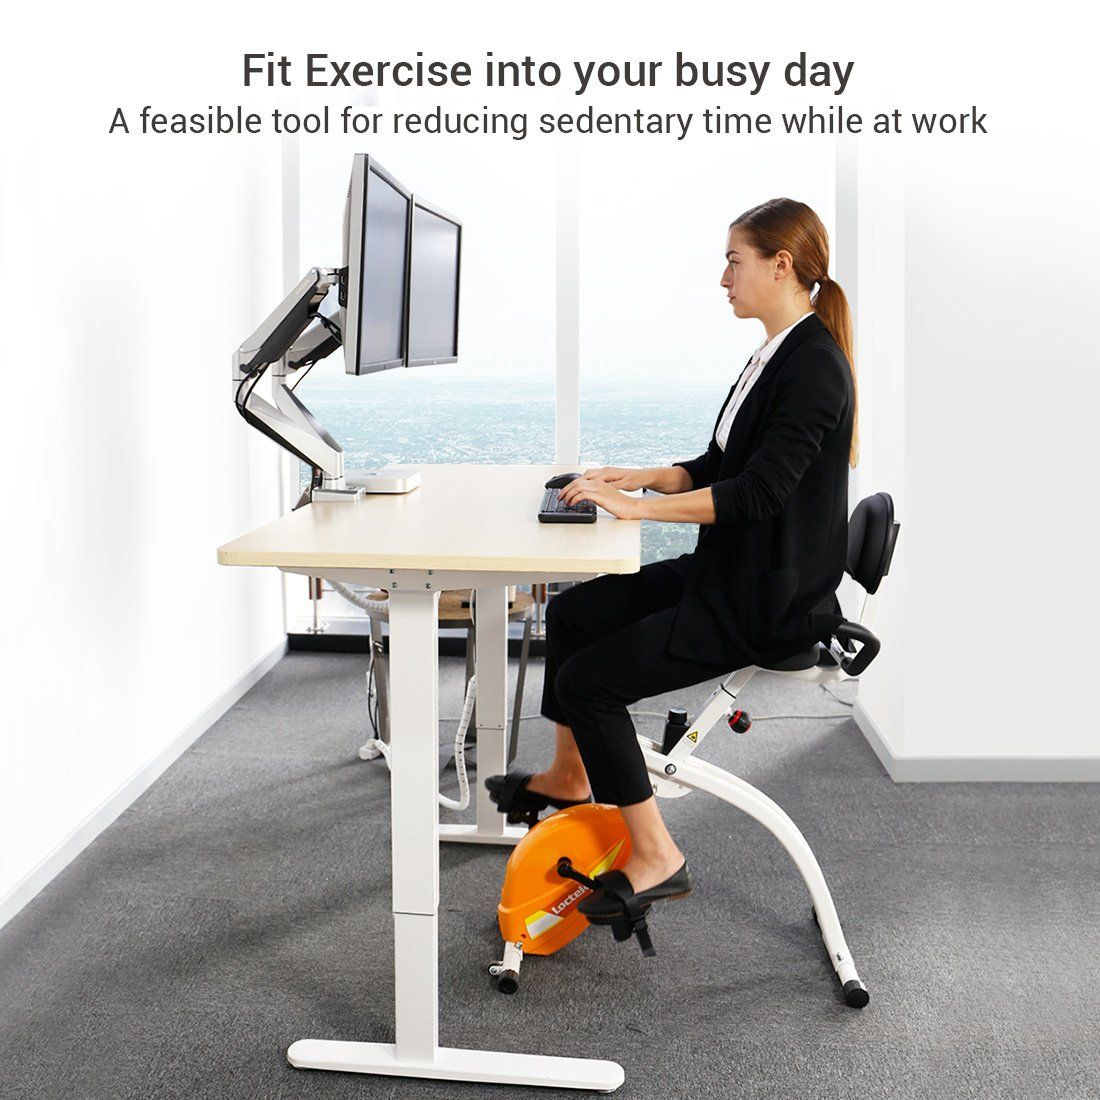 Flexispot Offers Under Desk Bikes Deskside Bike And Desk Cycle Adding More Movements Into Your Day Biking Workout Foldable Exercise Bike Desk Workout